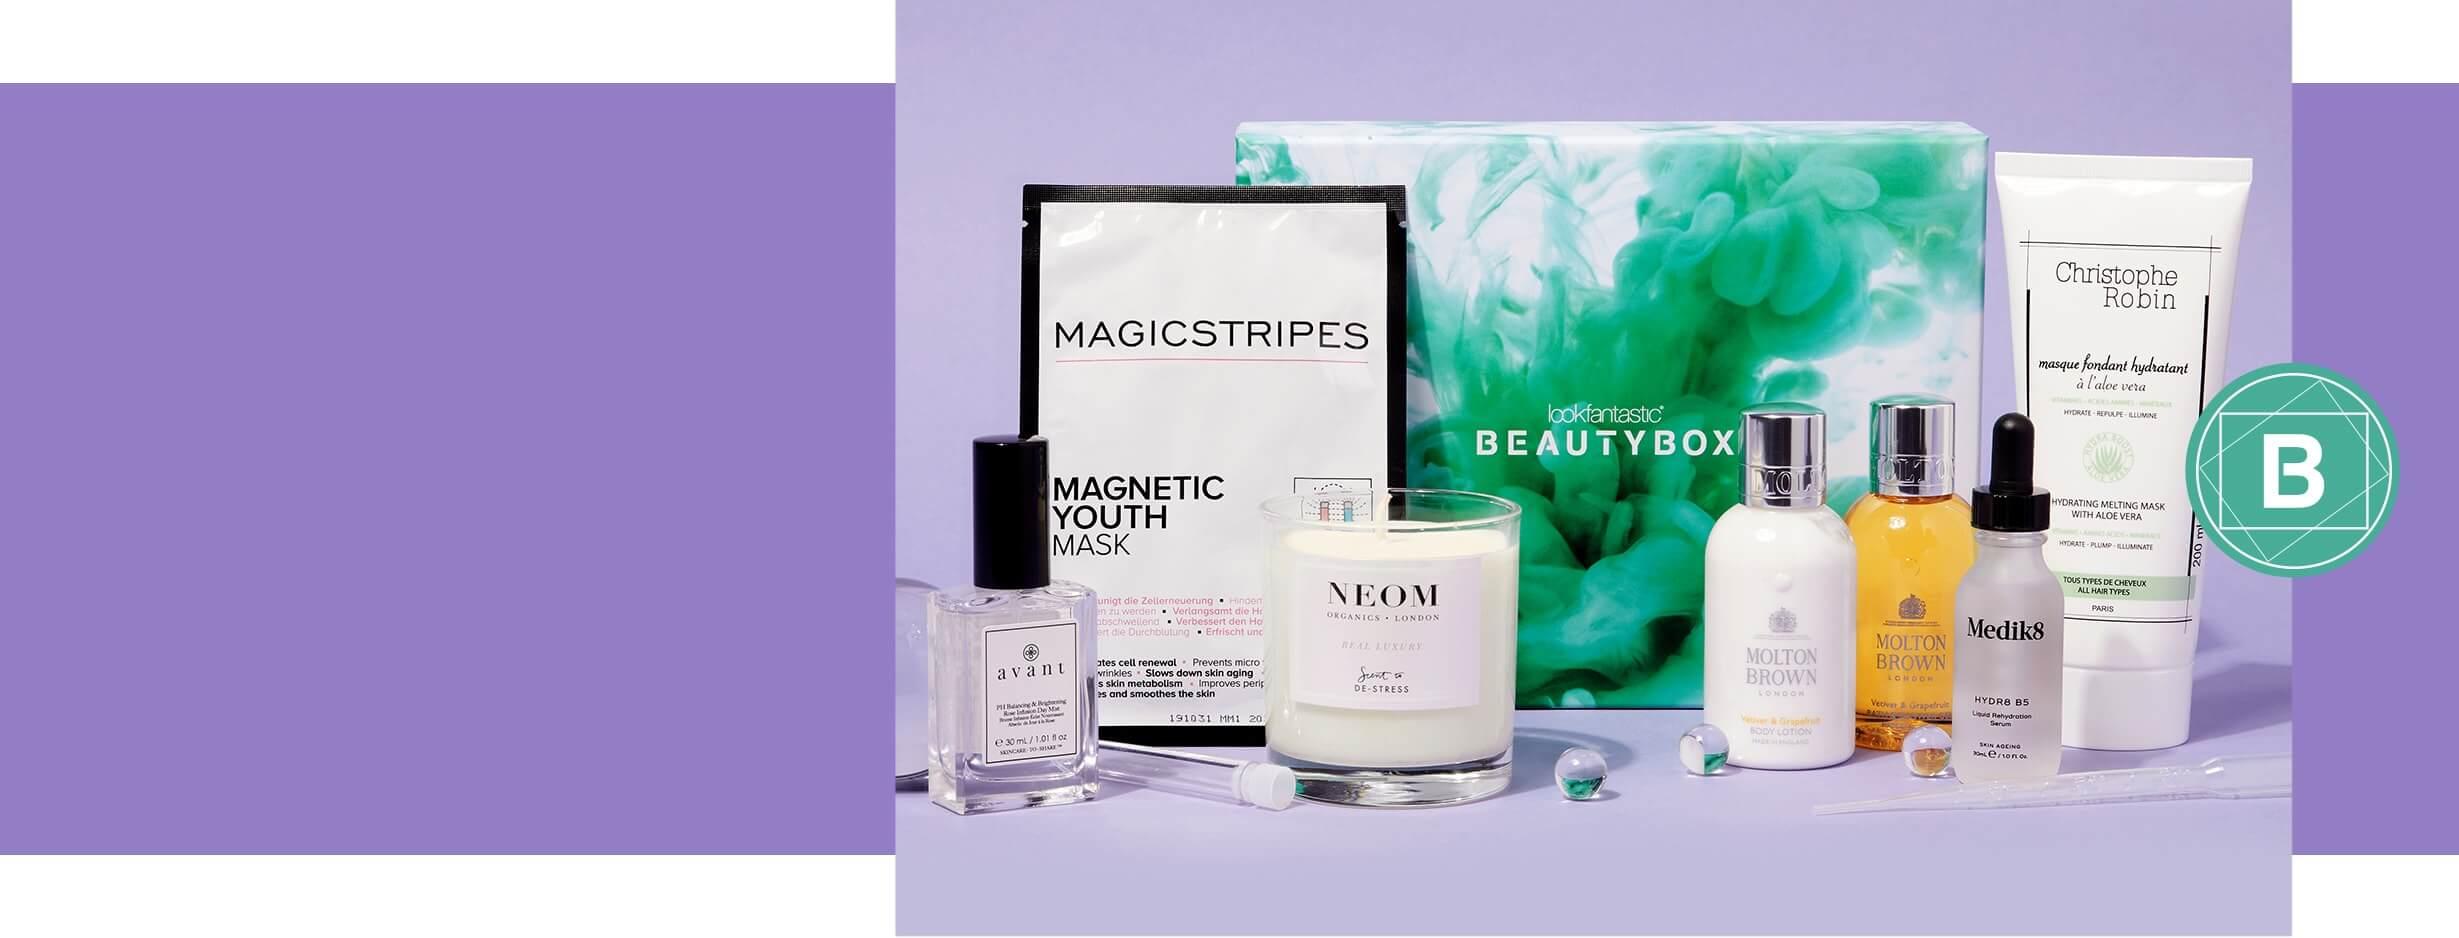 Science of Beauty Box